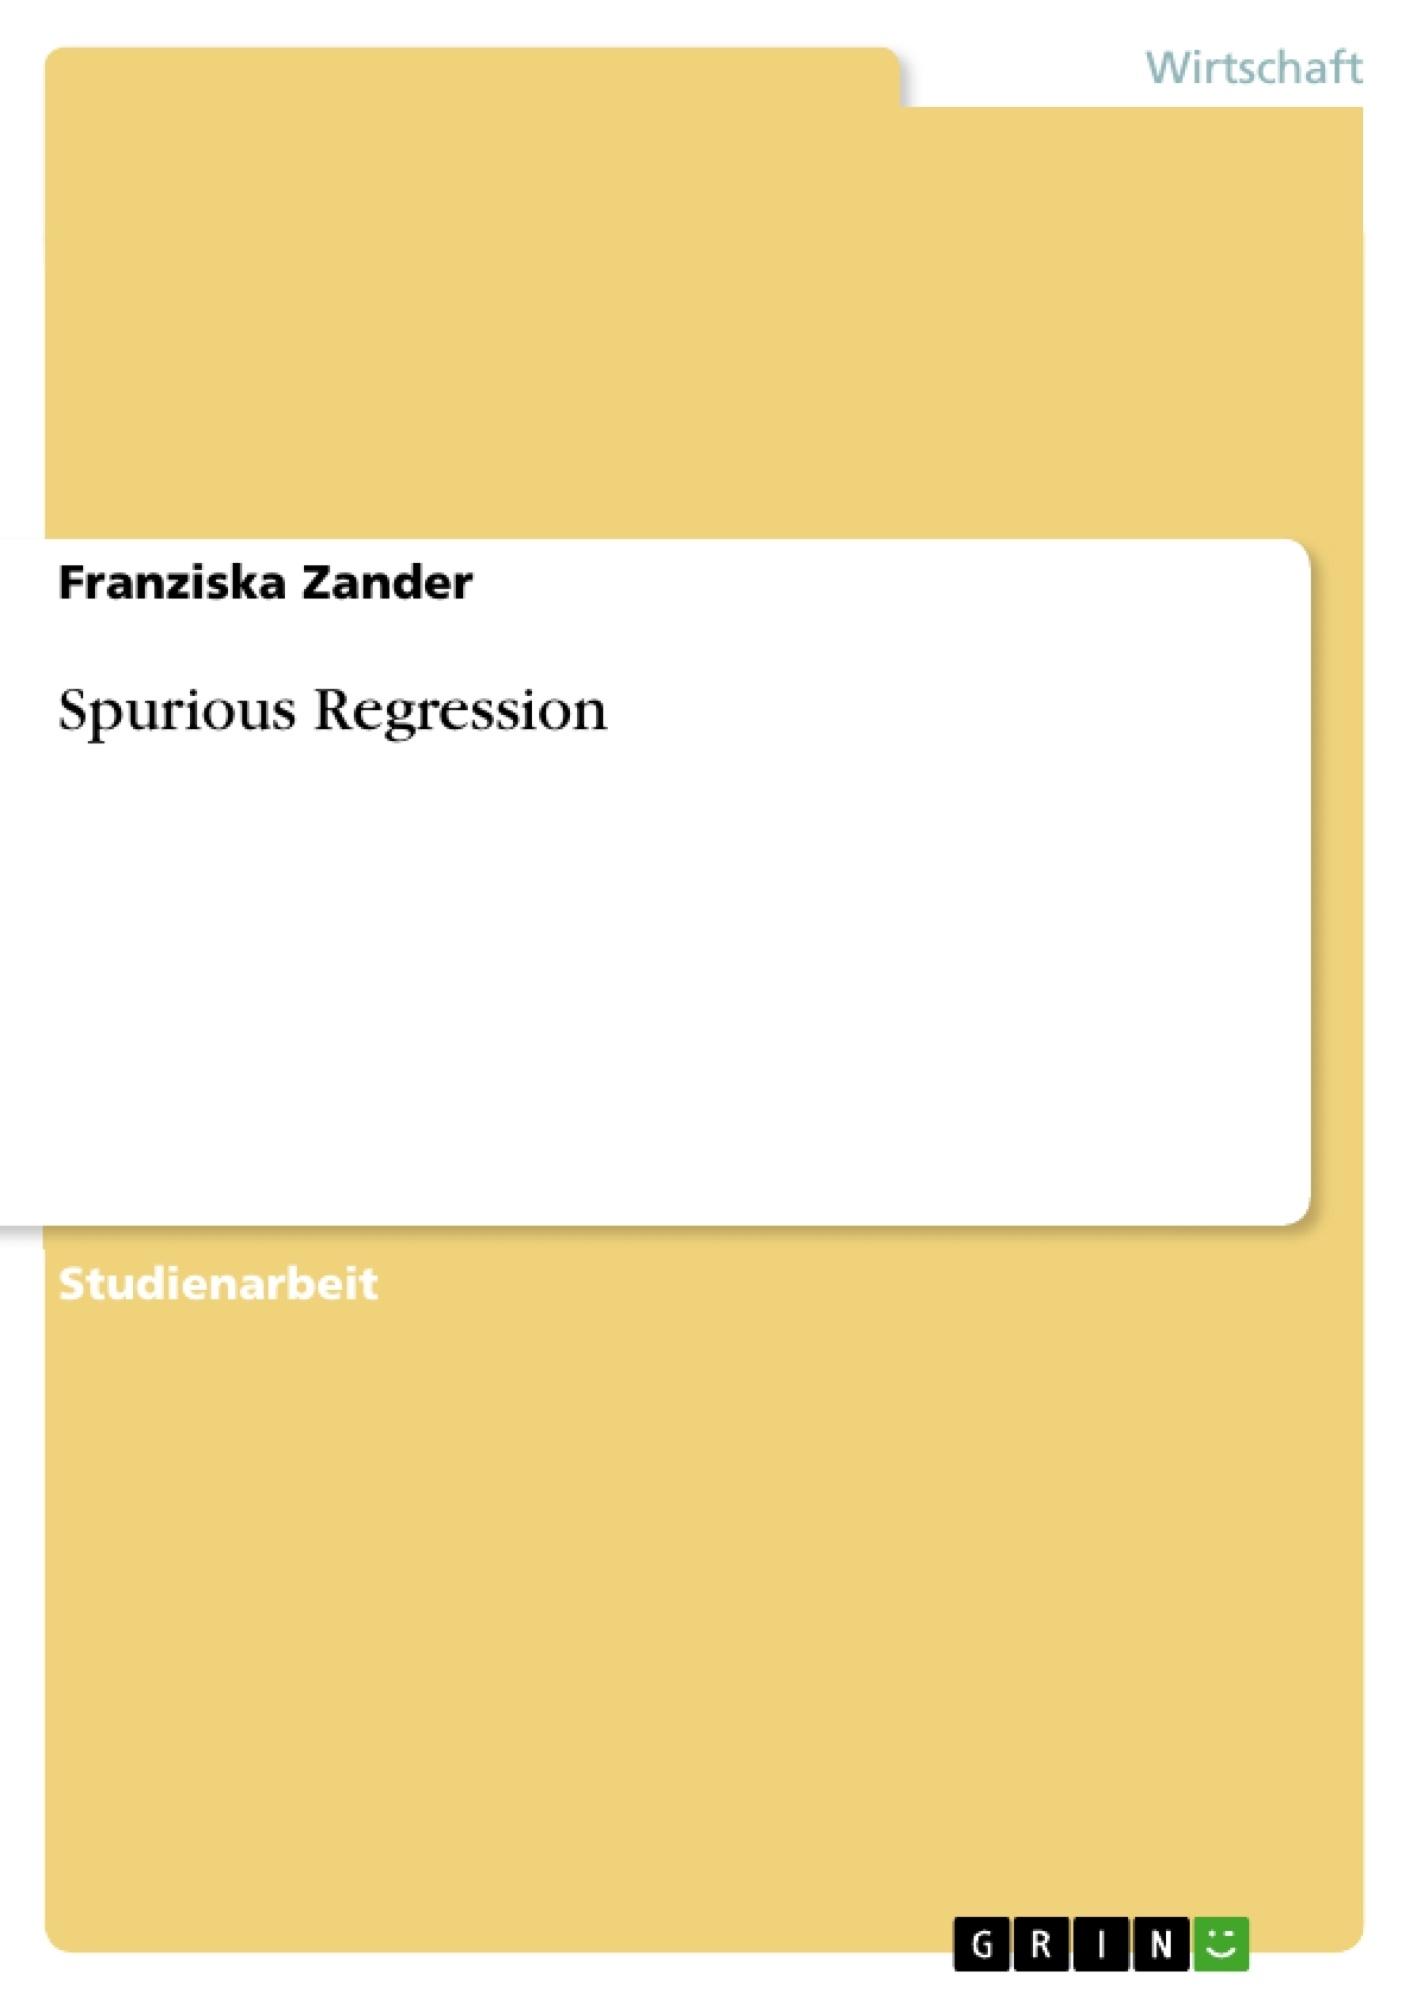 Titel: Spurious Regression